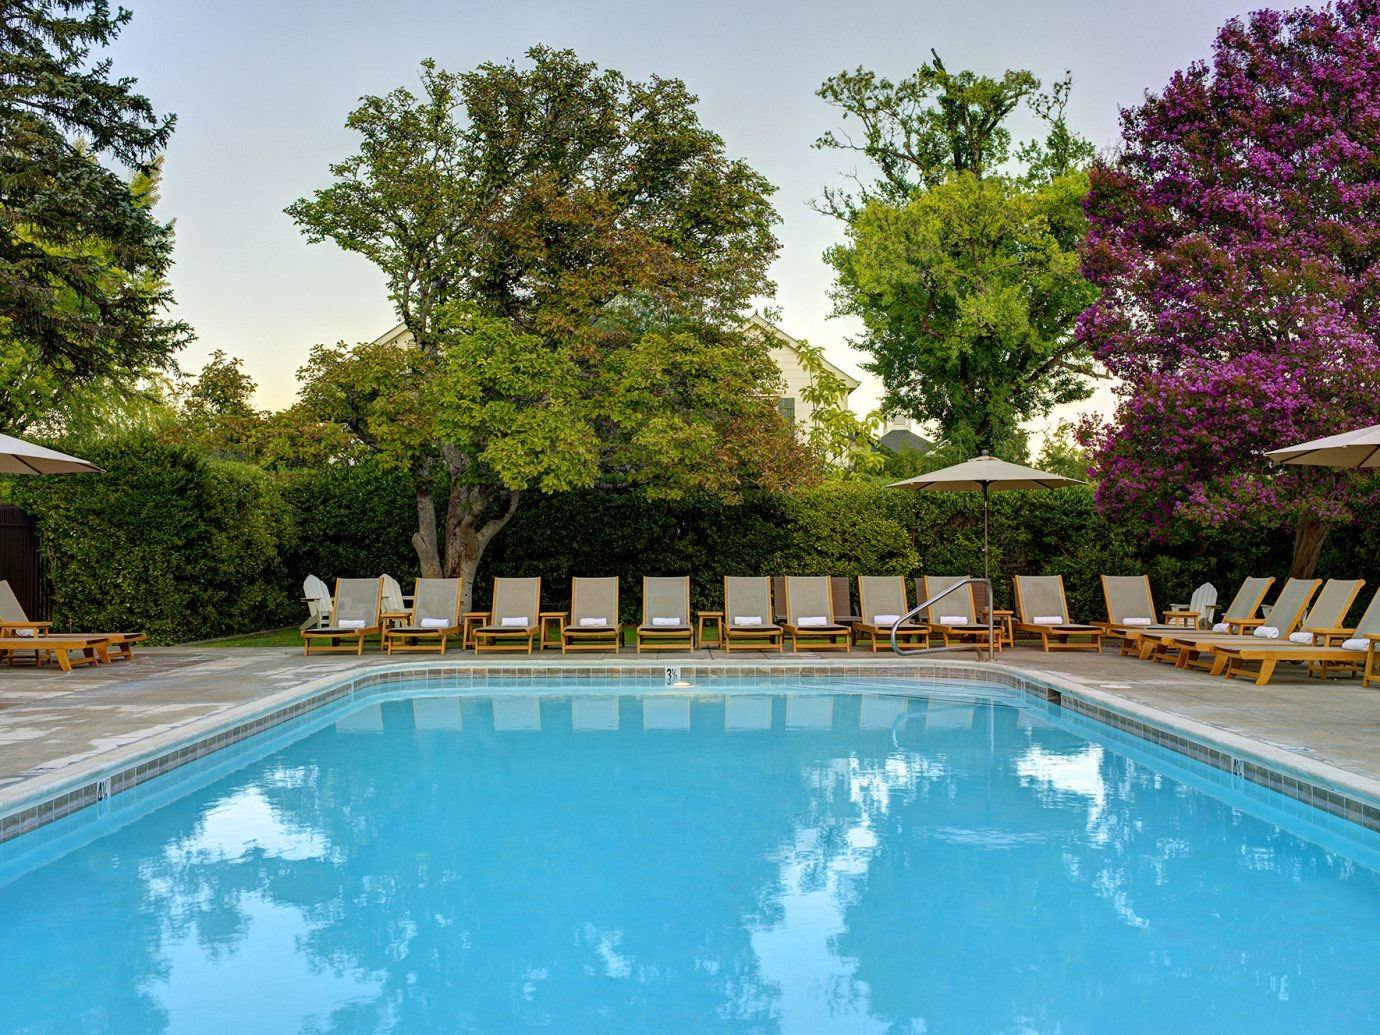 MacArthur Place pool